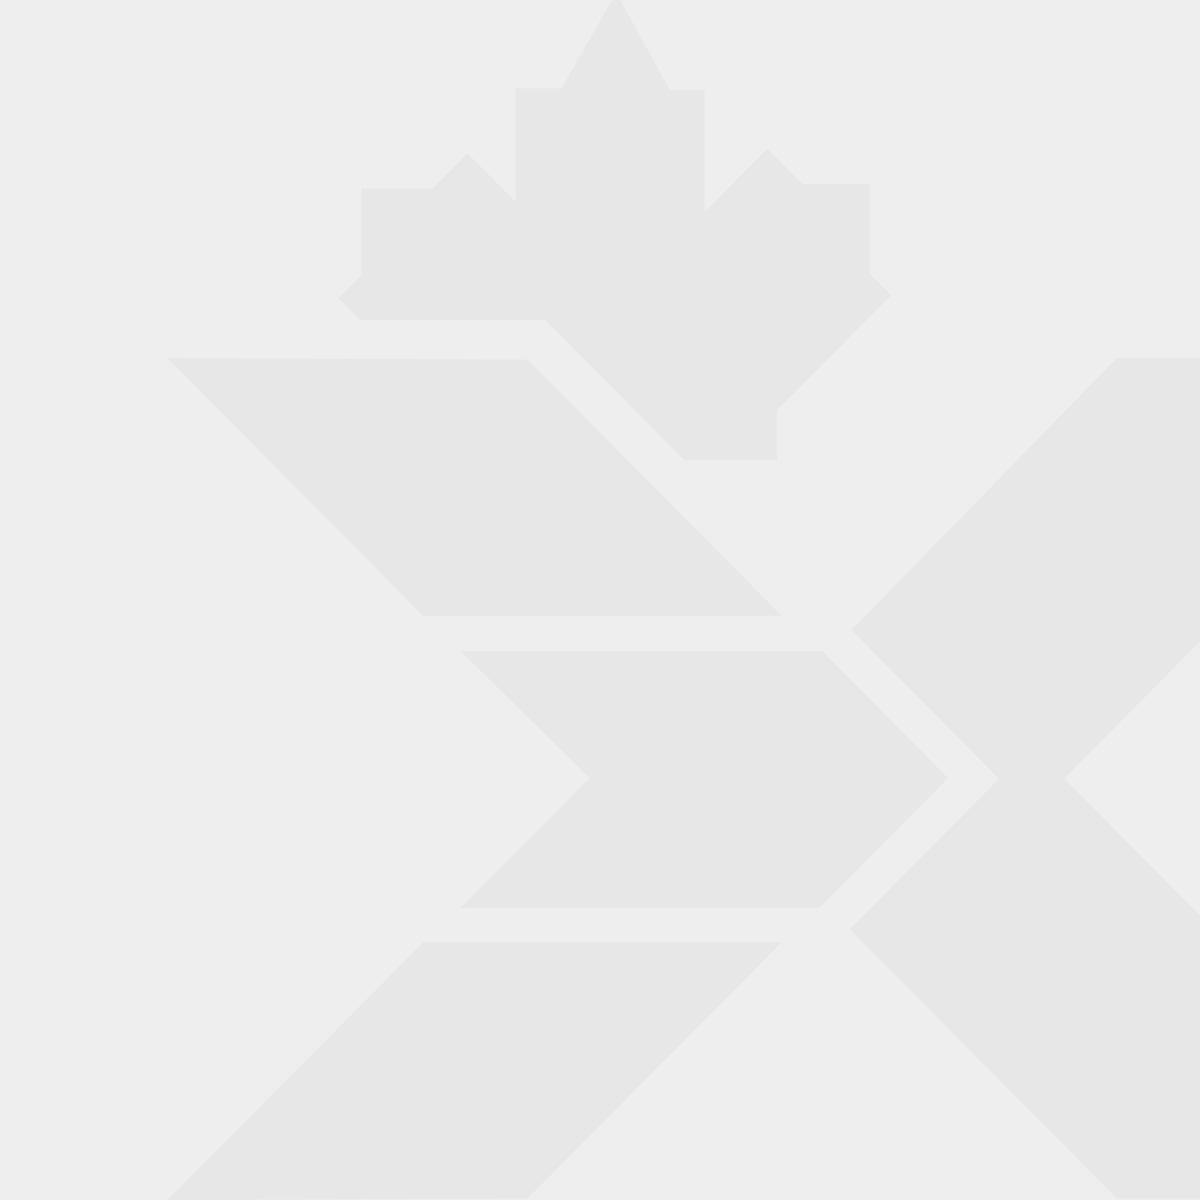 Club Rochelier Mens Slim Leather Wallet Black CRP352-RN-BLK (EA1)